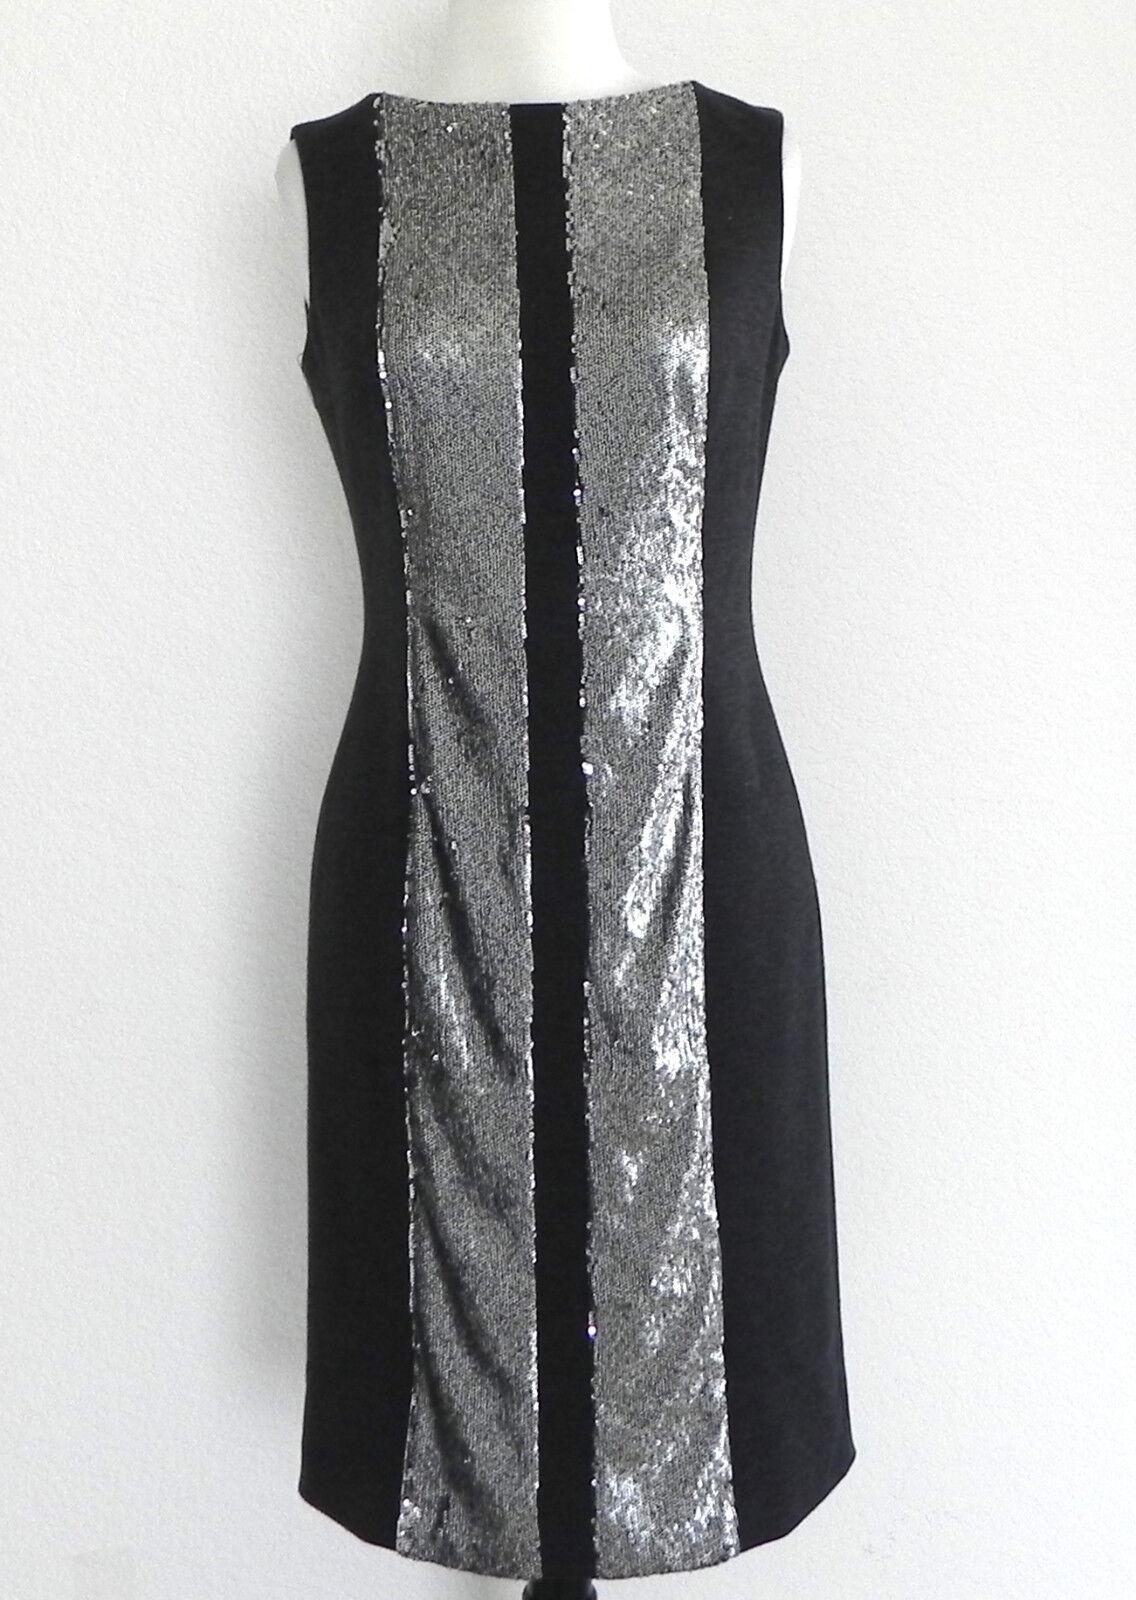 Teri Jon Dress Sheath Sleeveless Charcoal Sequin Trim Größe 4